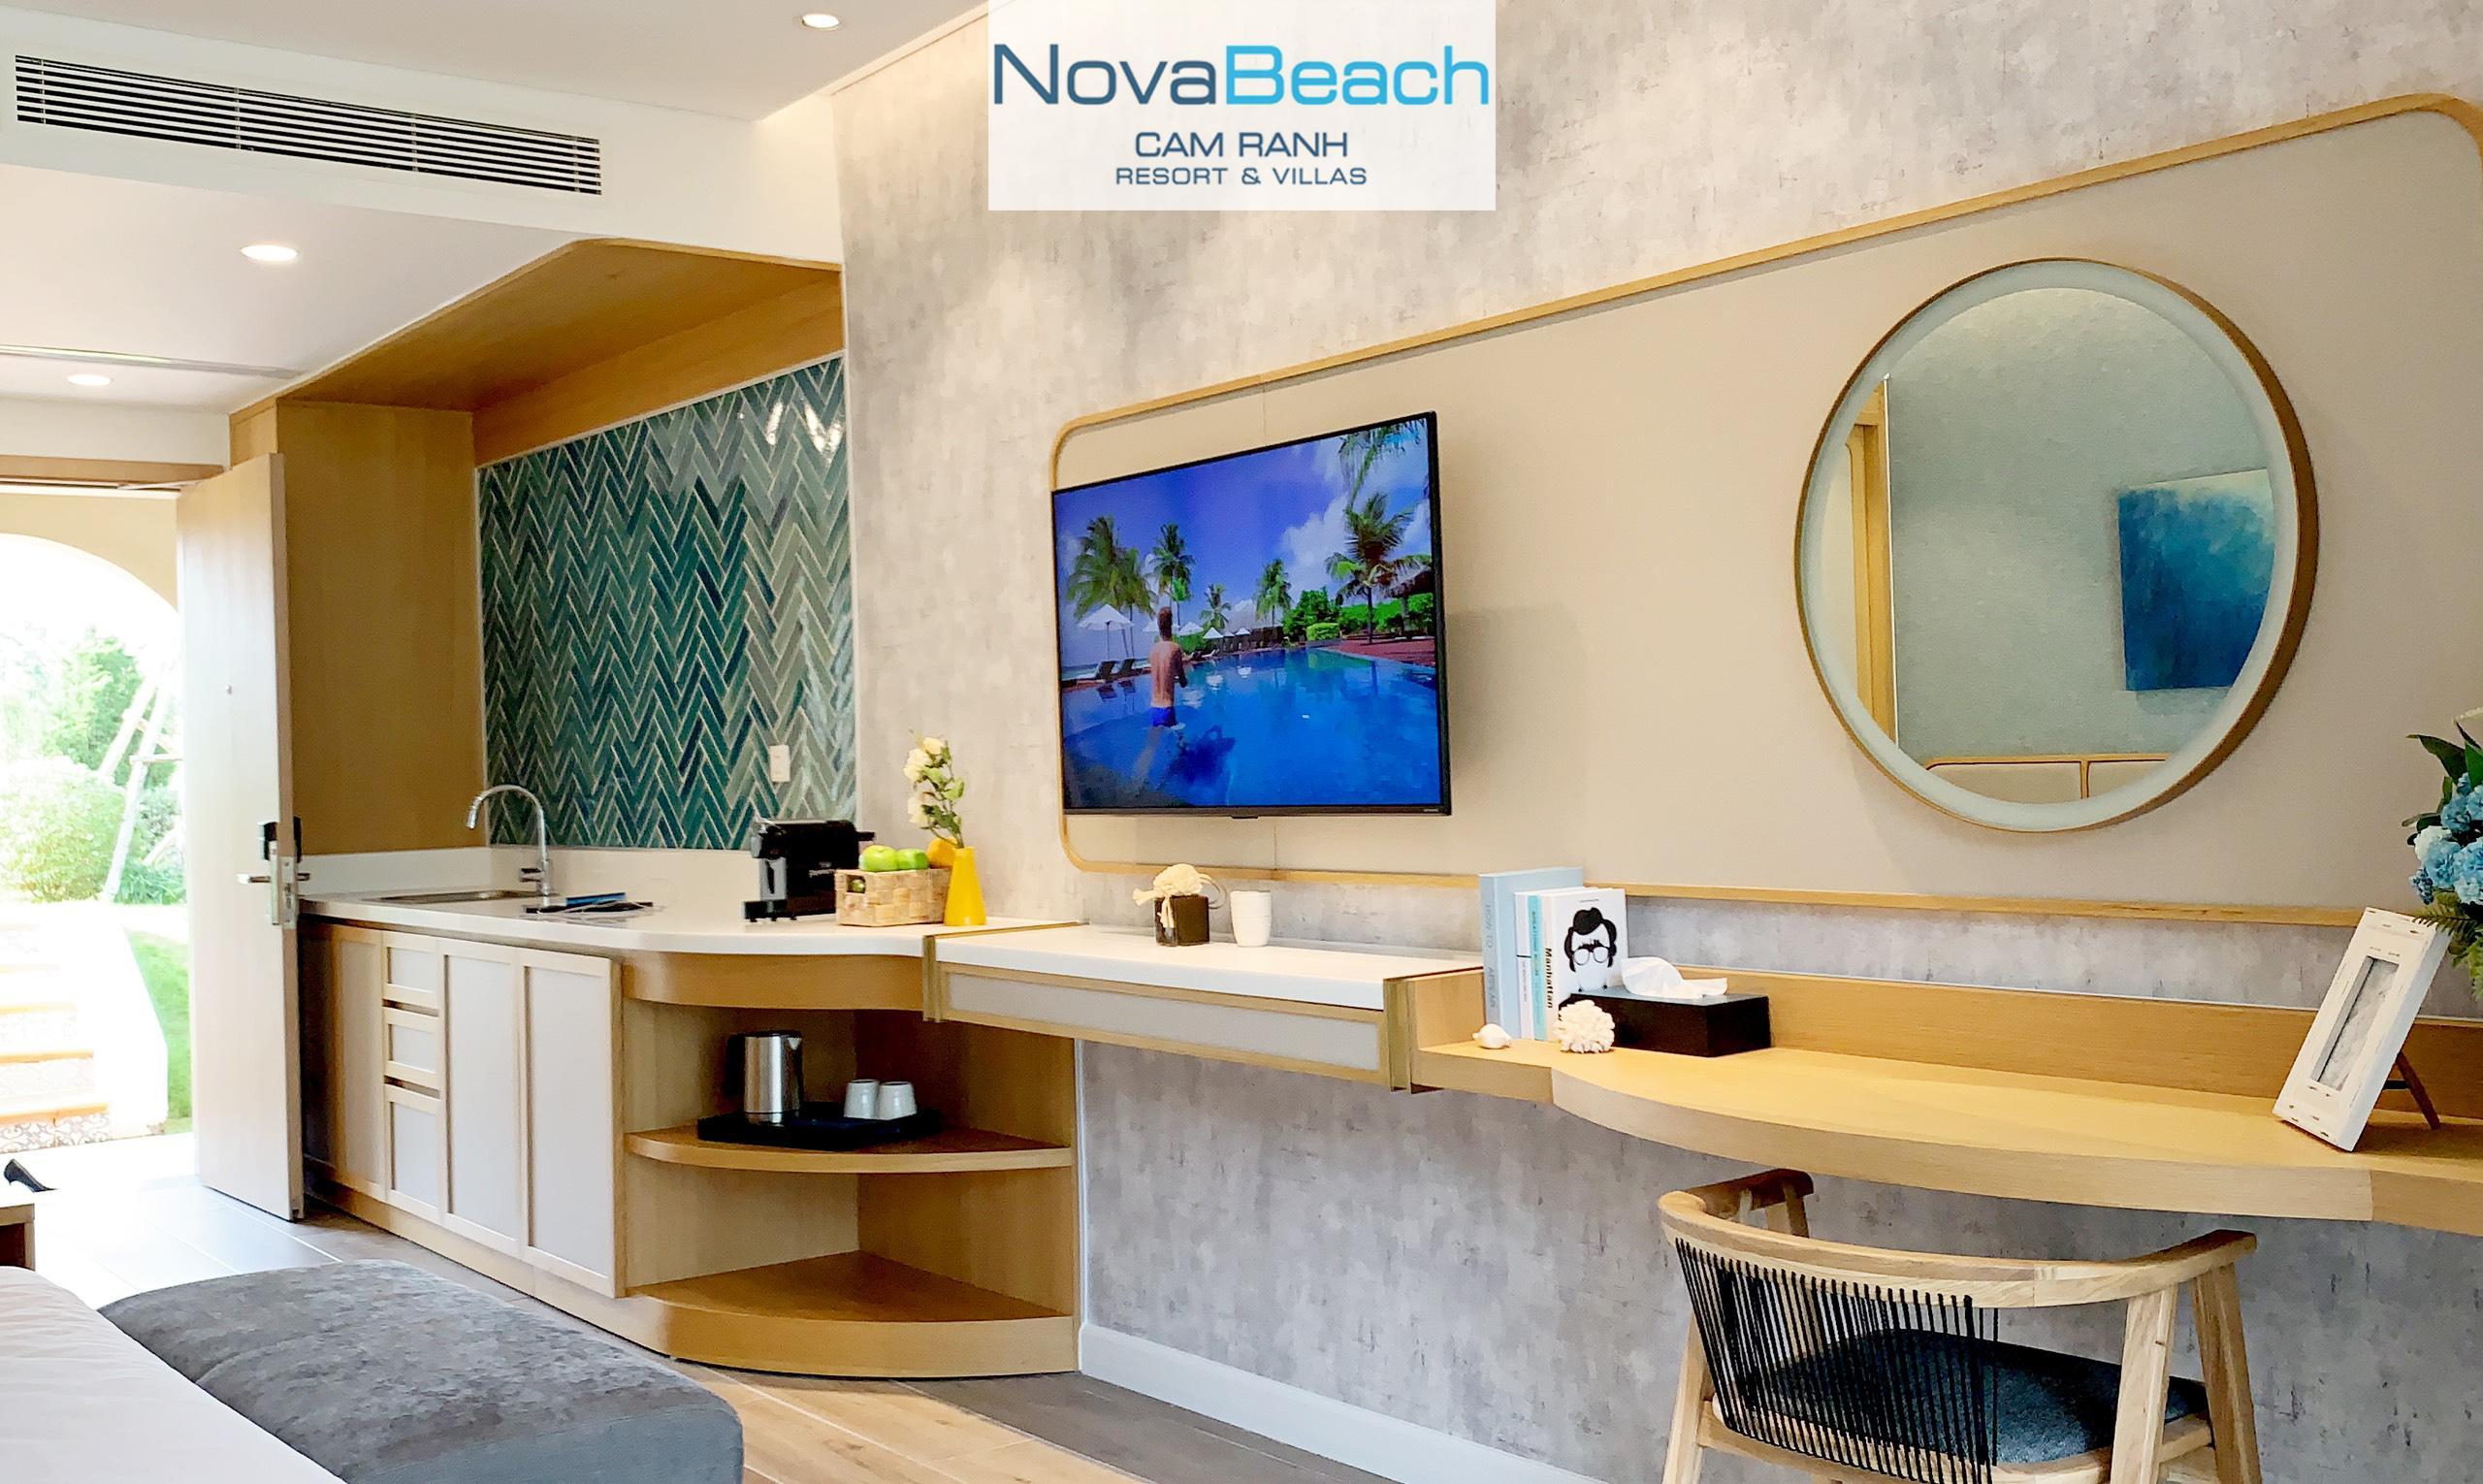 Căn hộ du lịch biển NovaBeach Cam Ranh